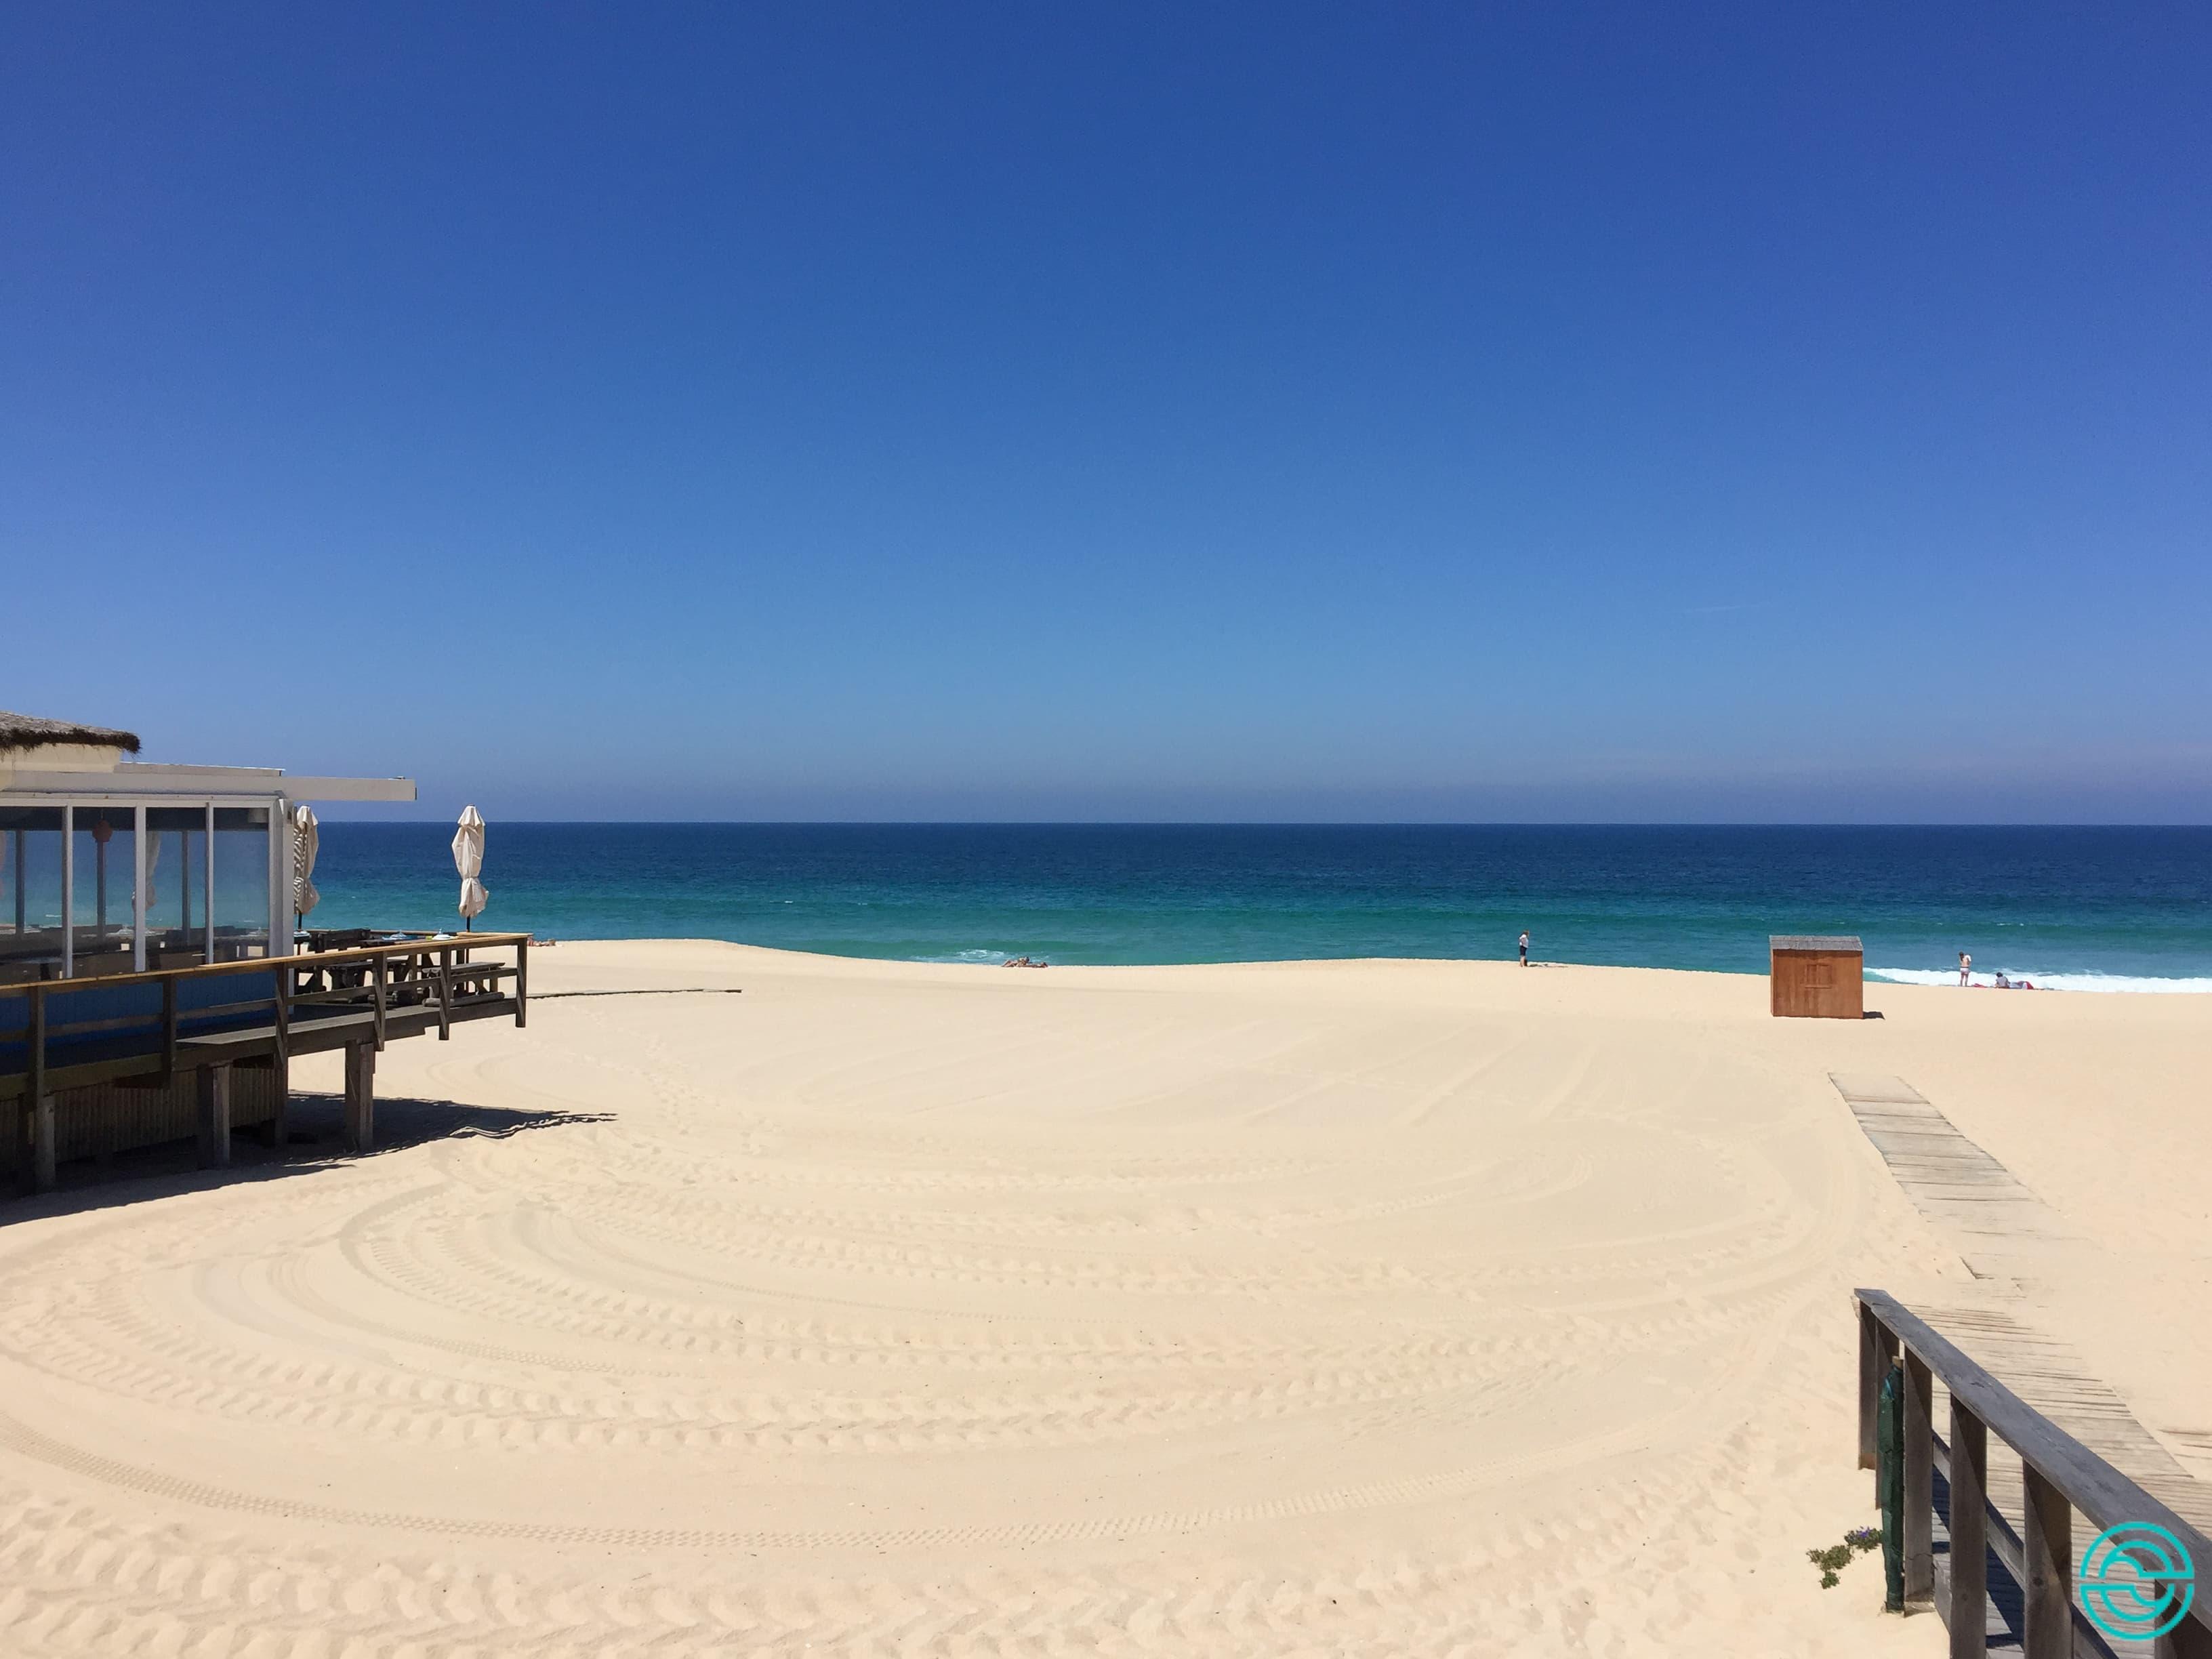 Beaches in Alentejo Carvalhal